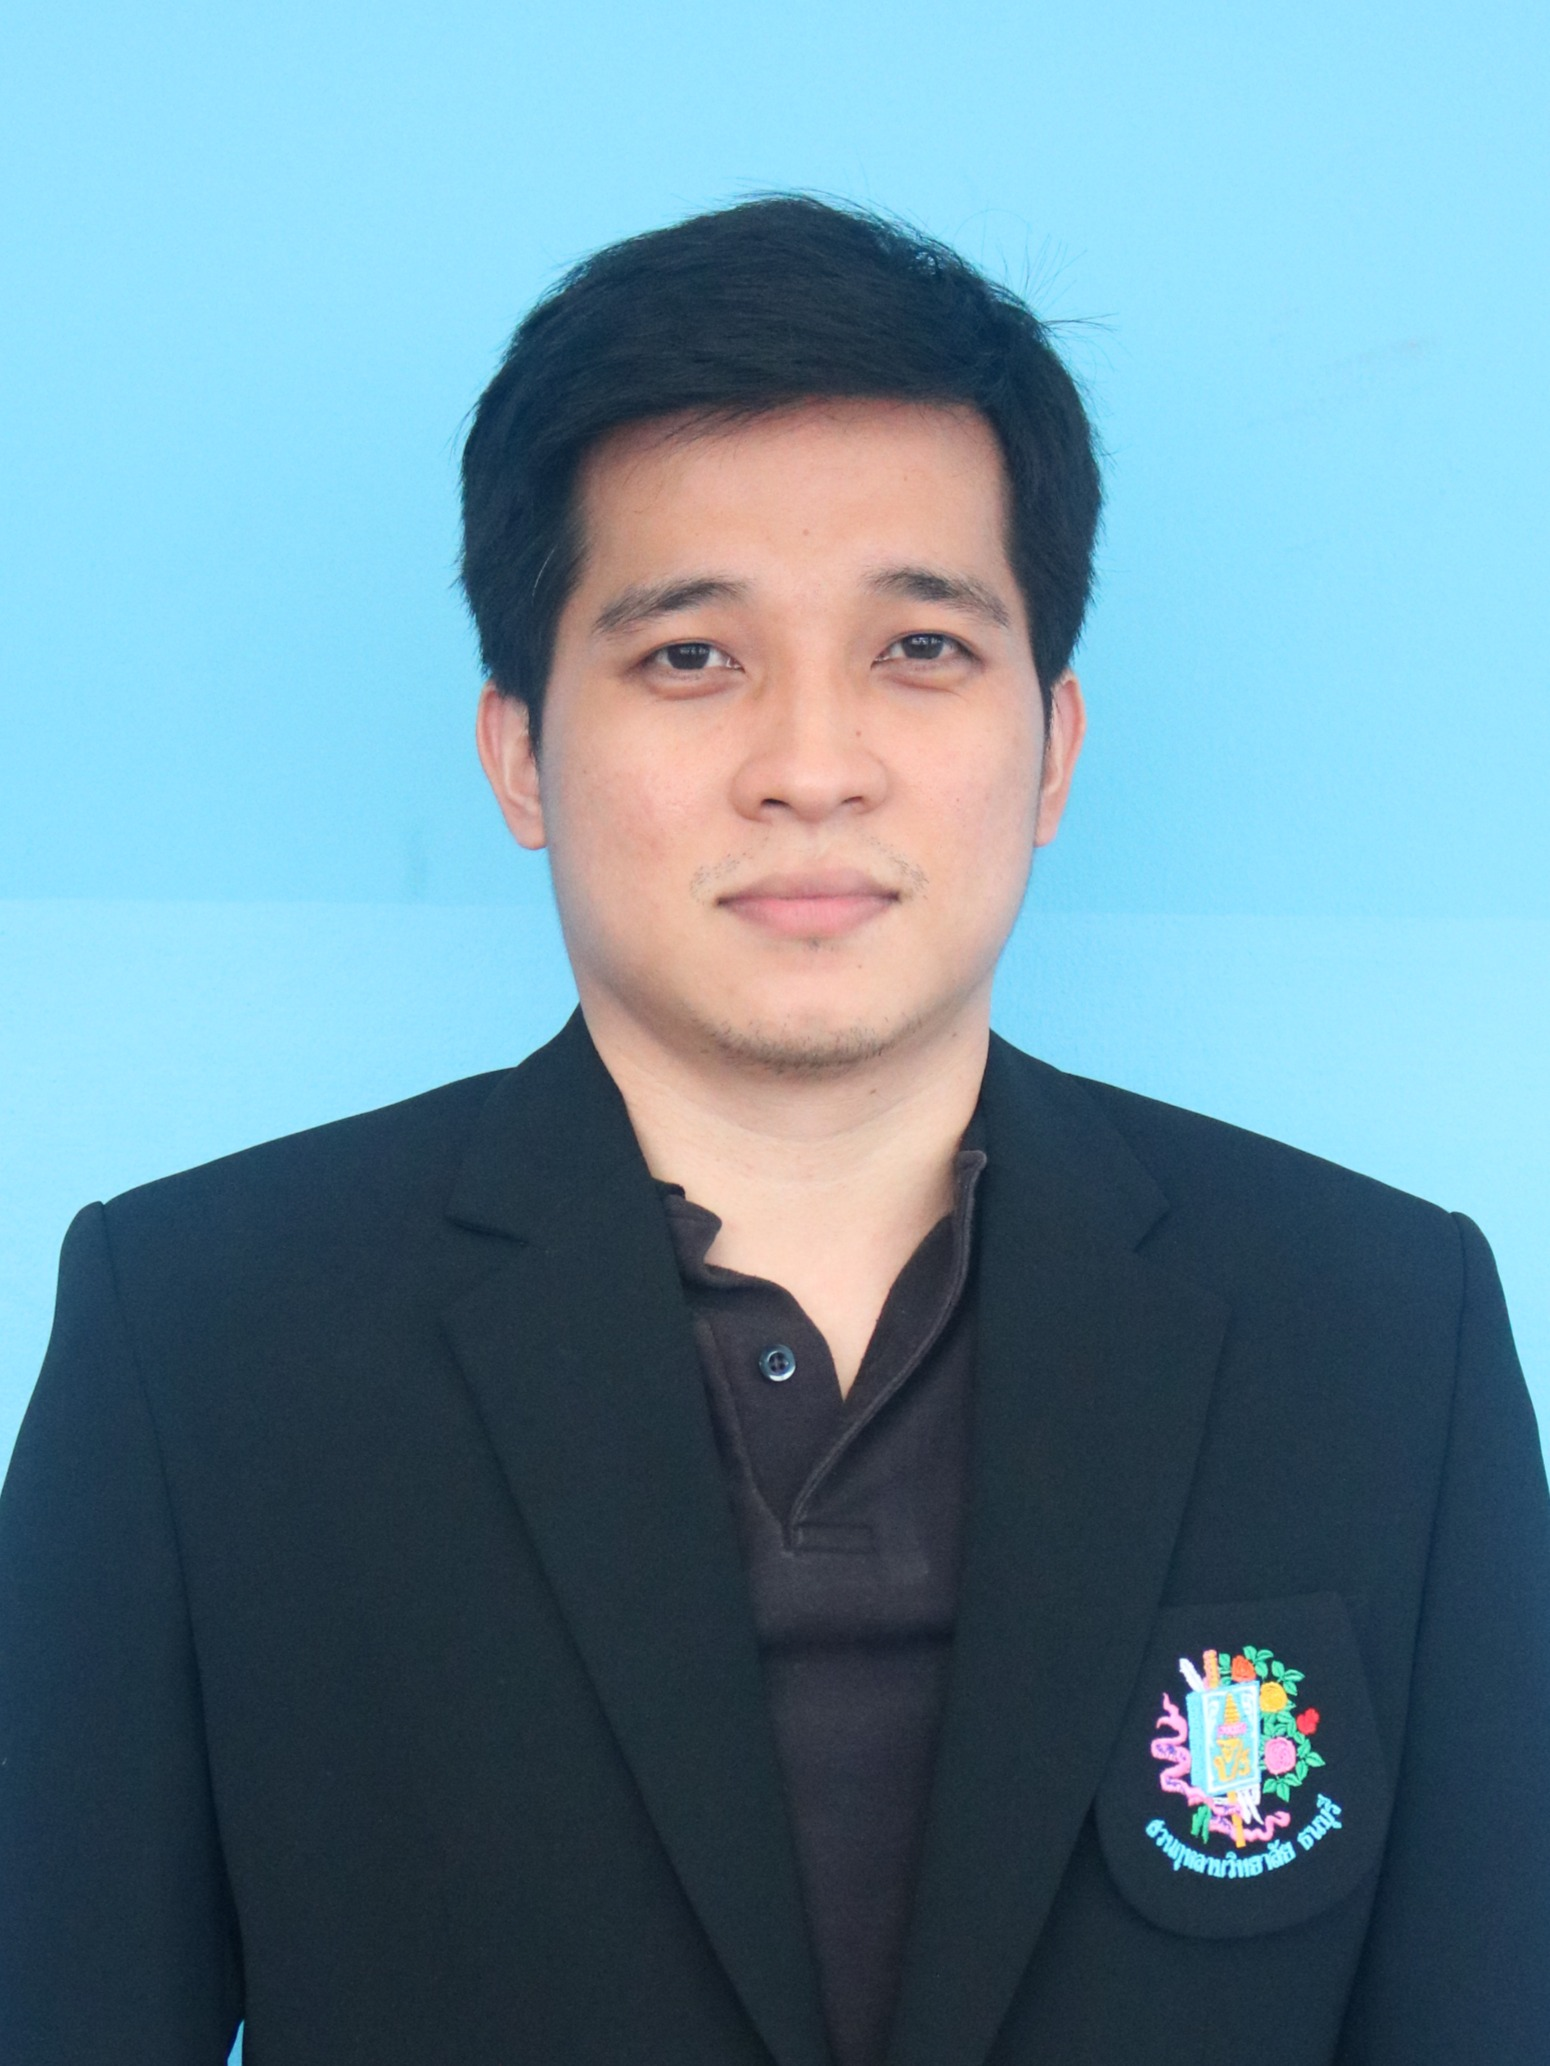 Mr. Sompob Saelee